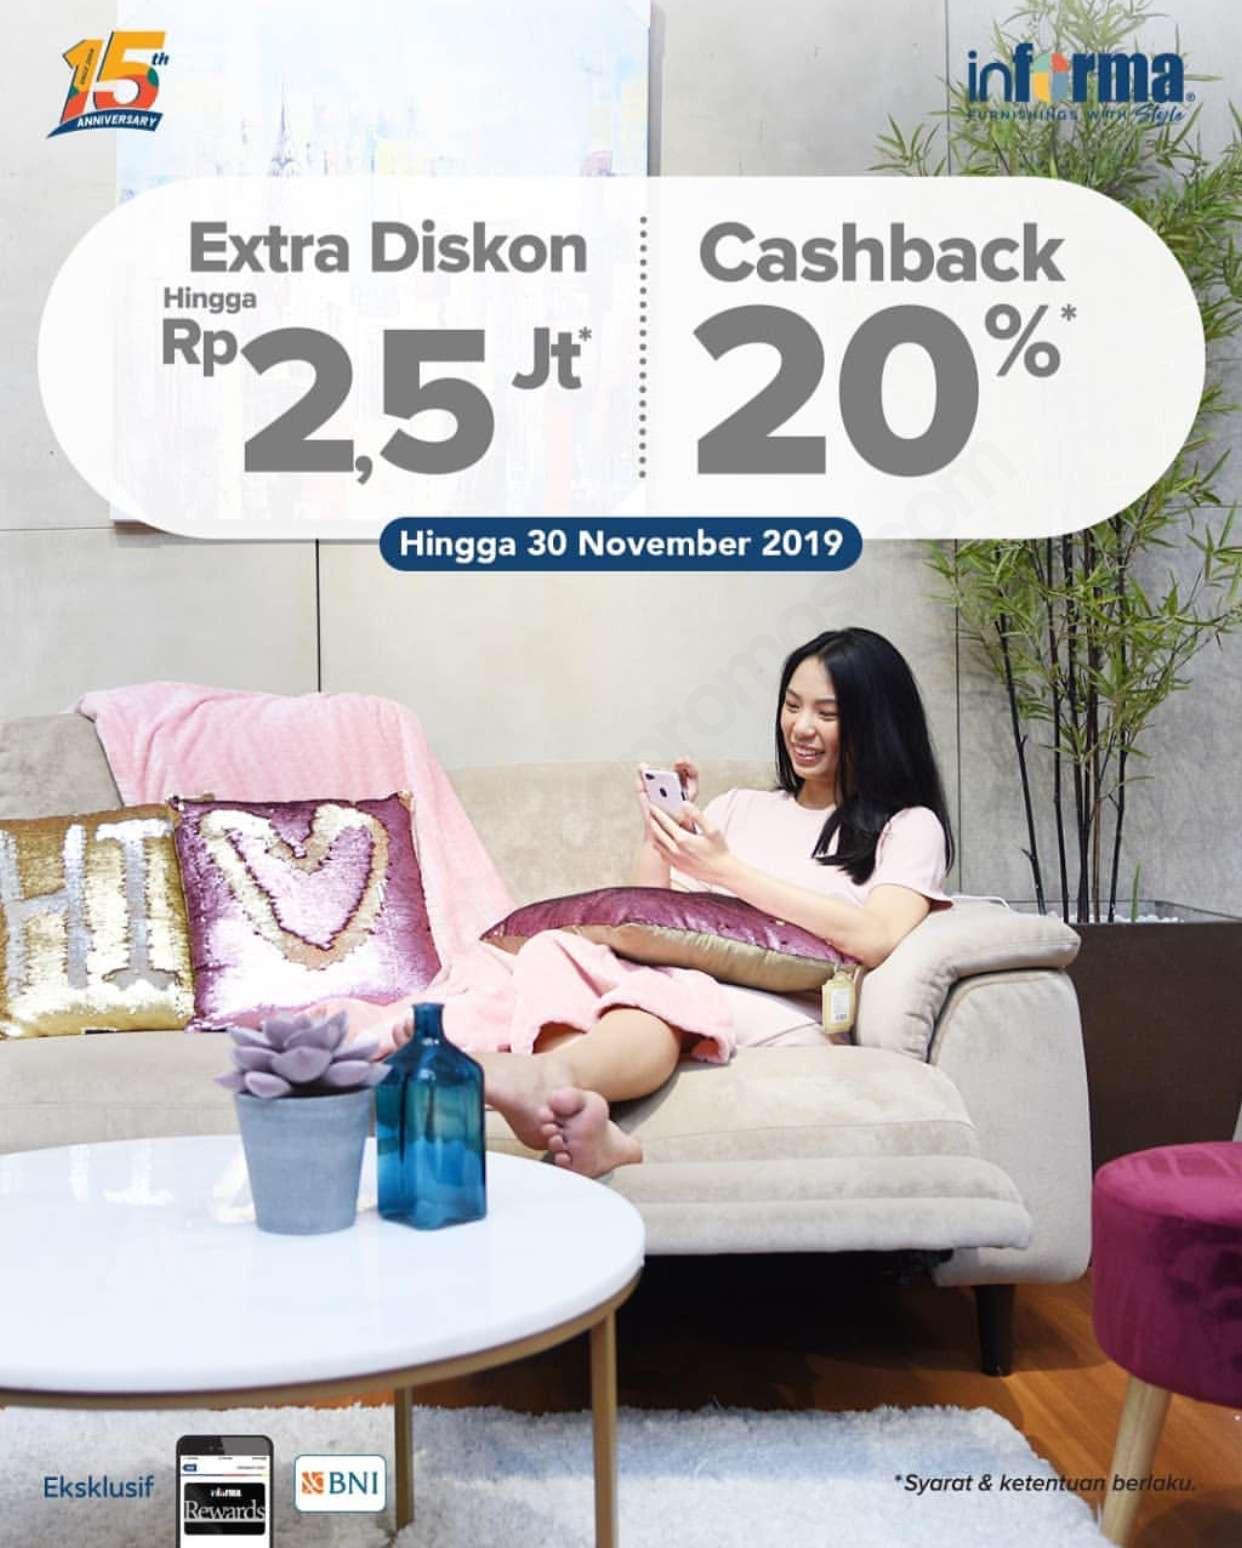 Informa Promo Double Deals Extra Discount hingga Rp 2.5 Juta dan Cashback 20%